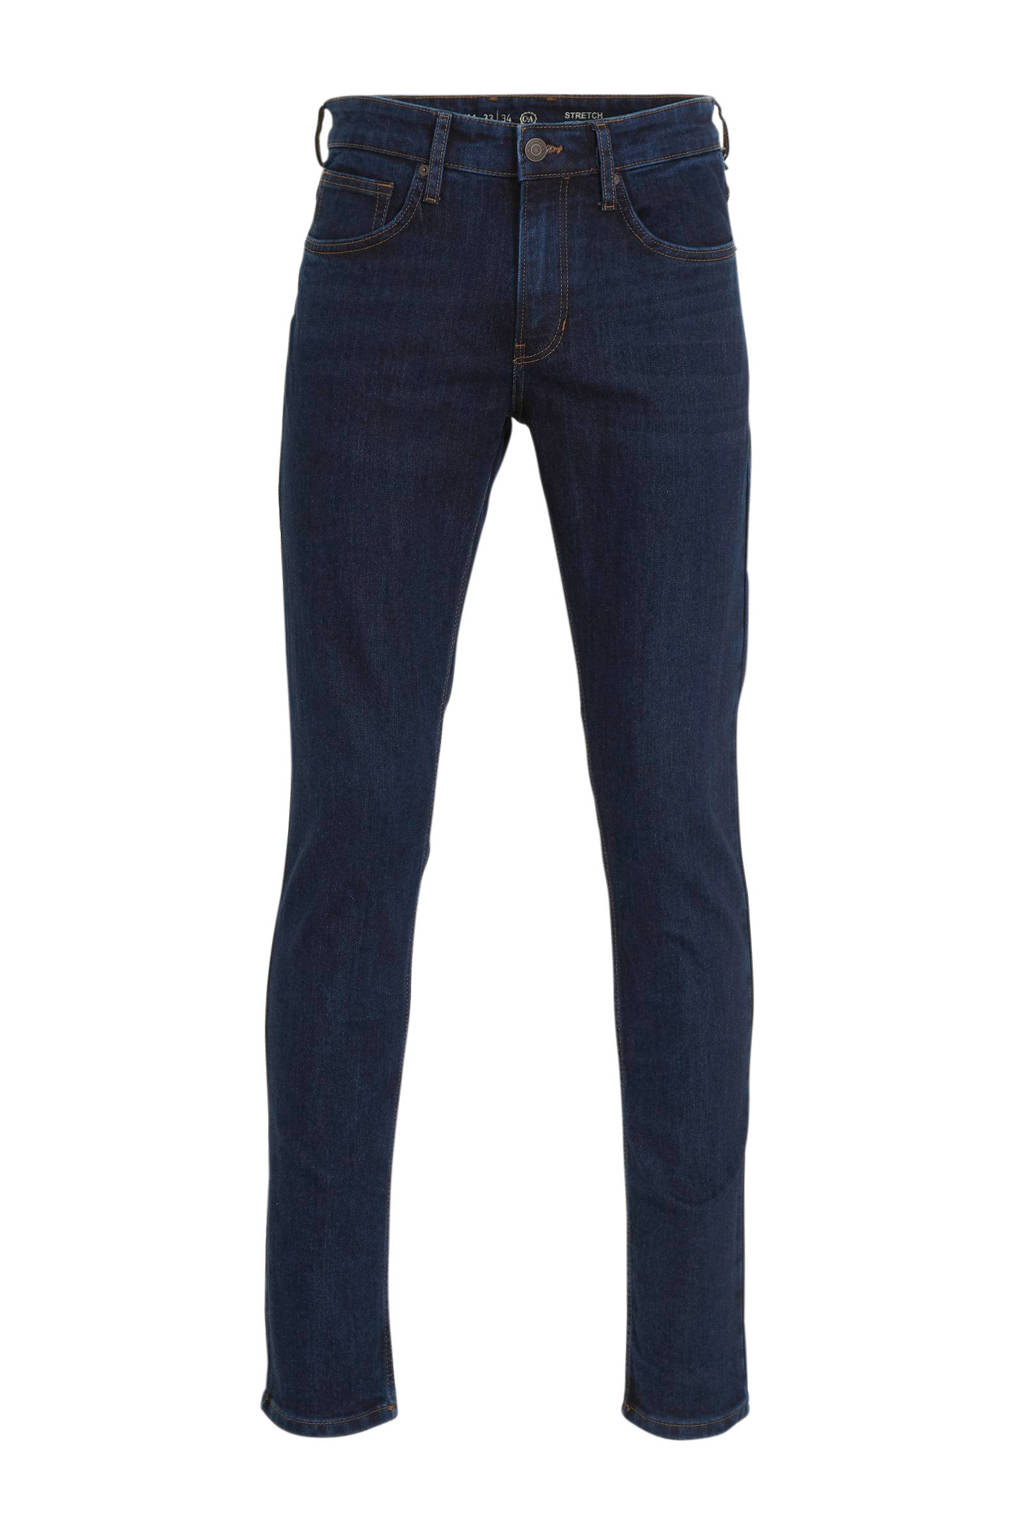 C&A The Denim slim fit jeans dark blue, Dark Blue